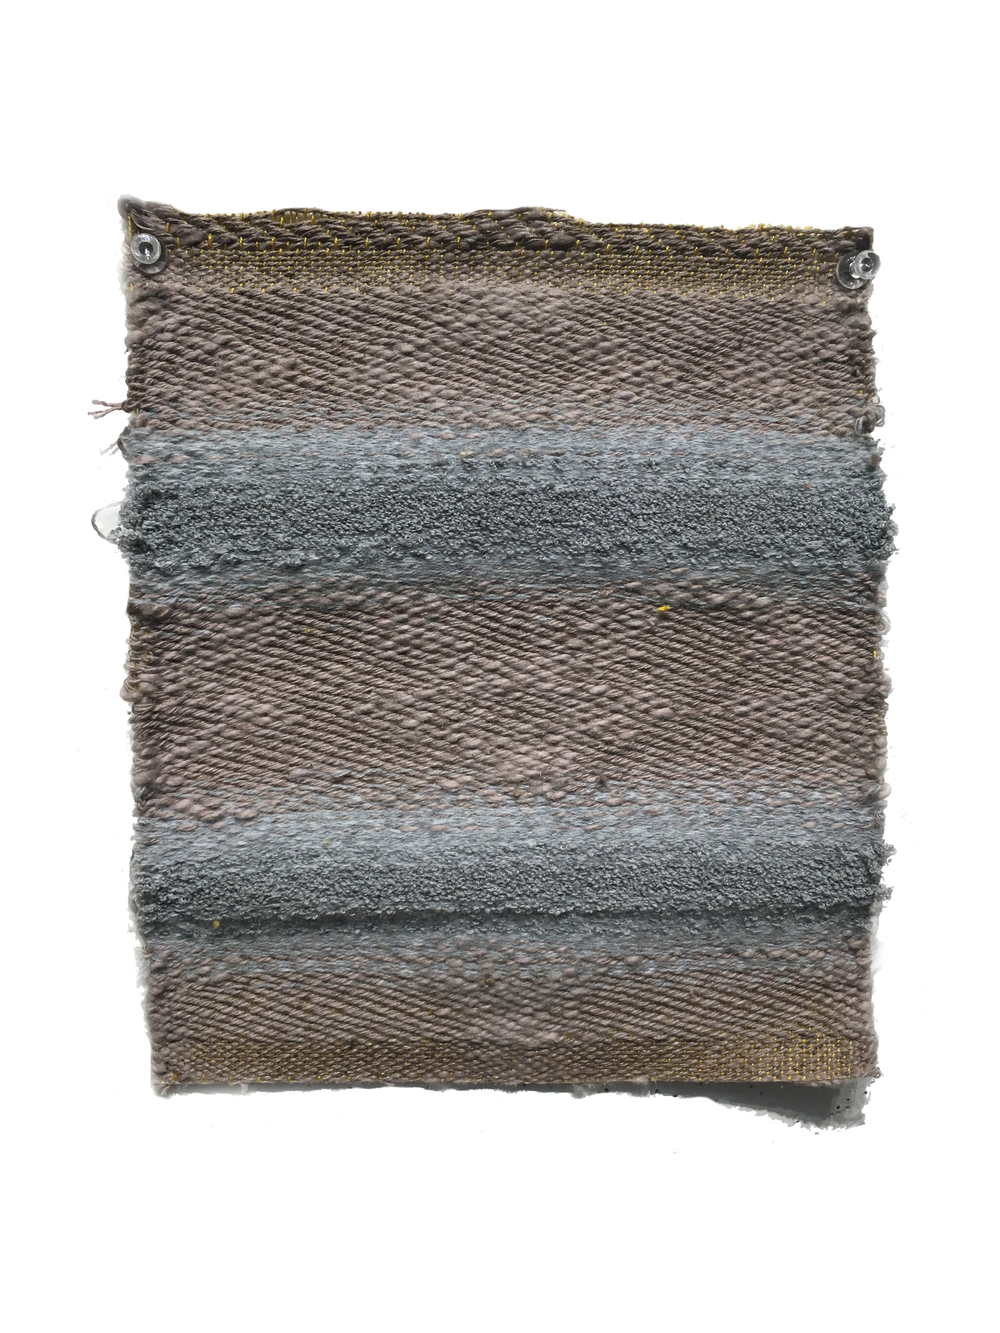 weaving1sample4.jpg